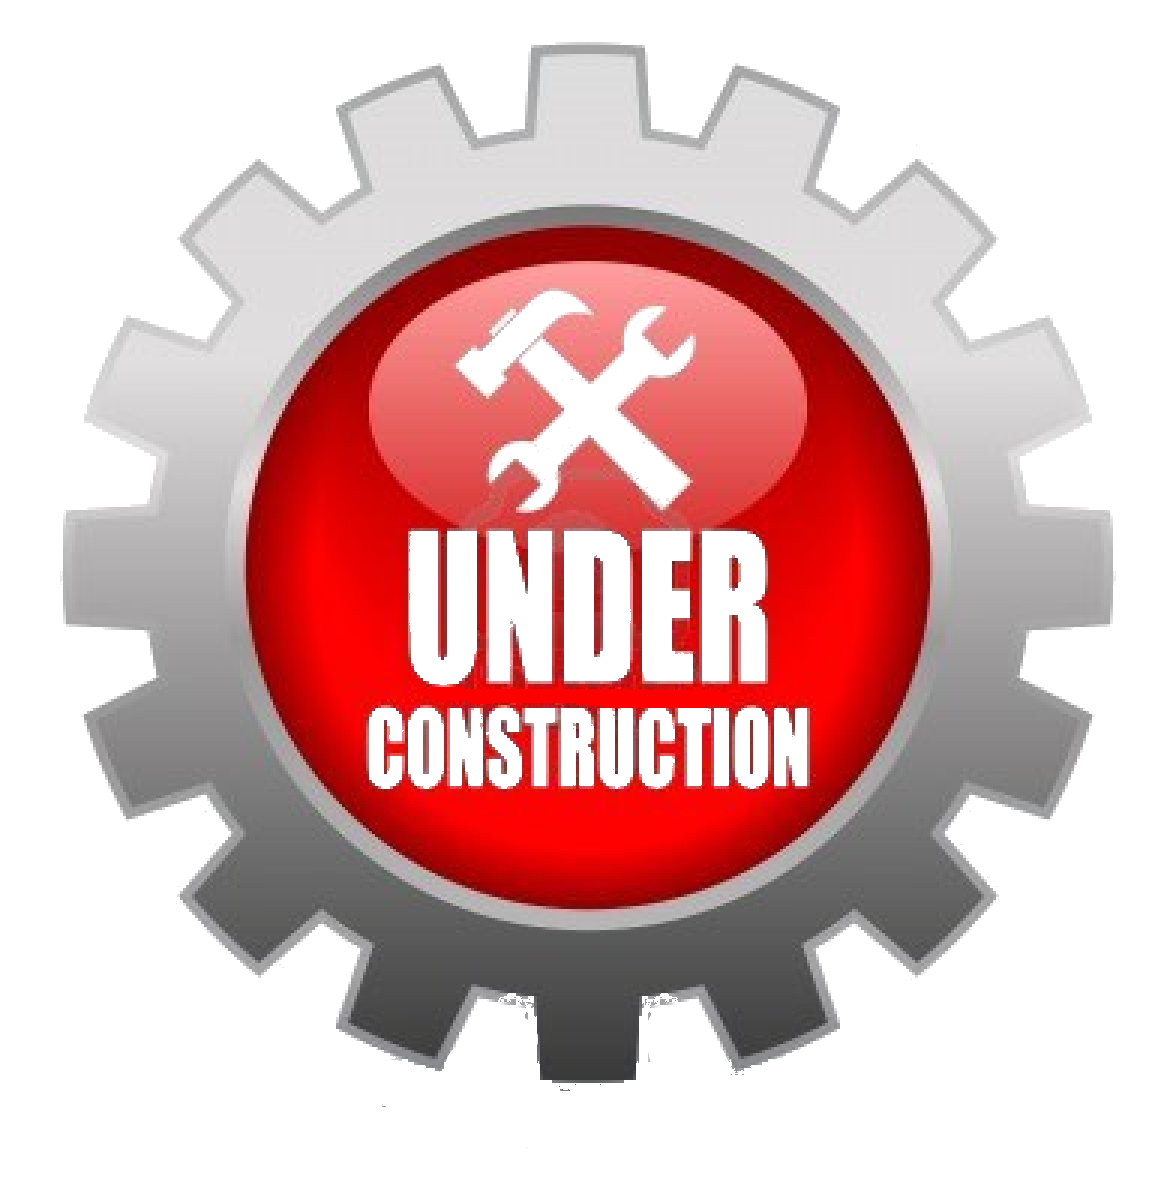 Warriors New Arena Under Construction: Image - UnderConstruction.png